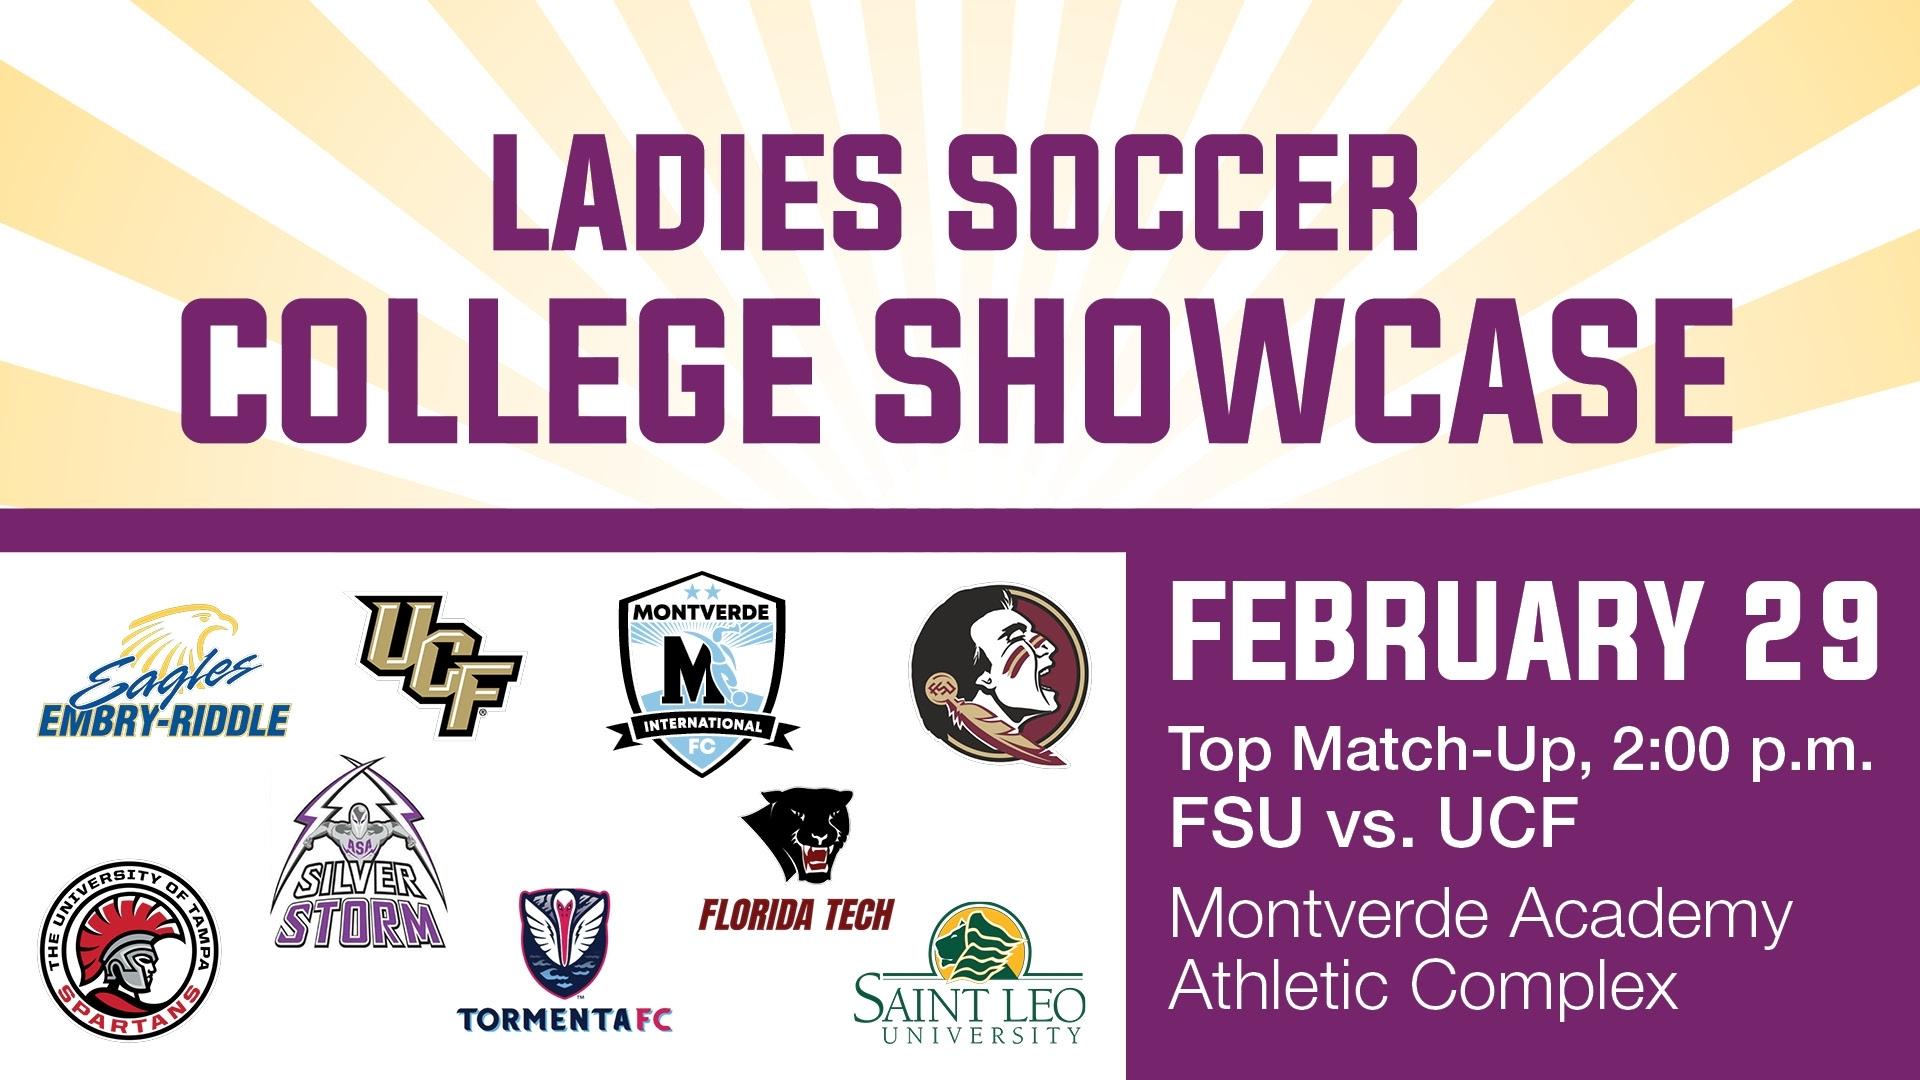 The 2020 Ladies Soccer College Showcase - Montverde Academy